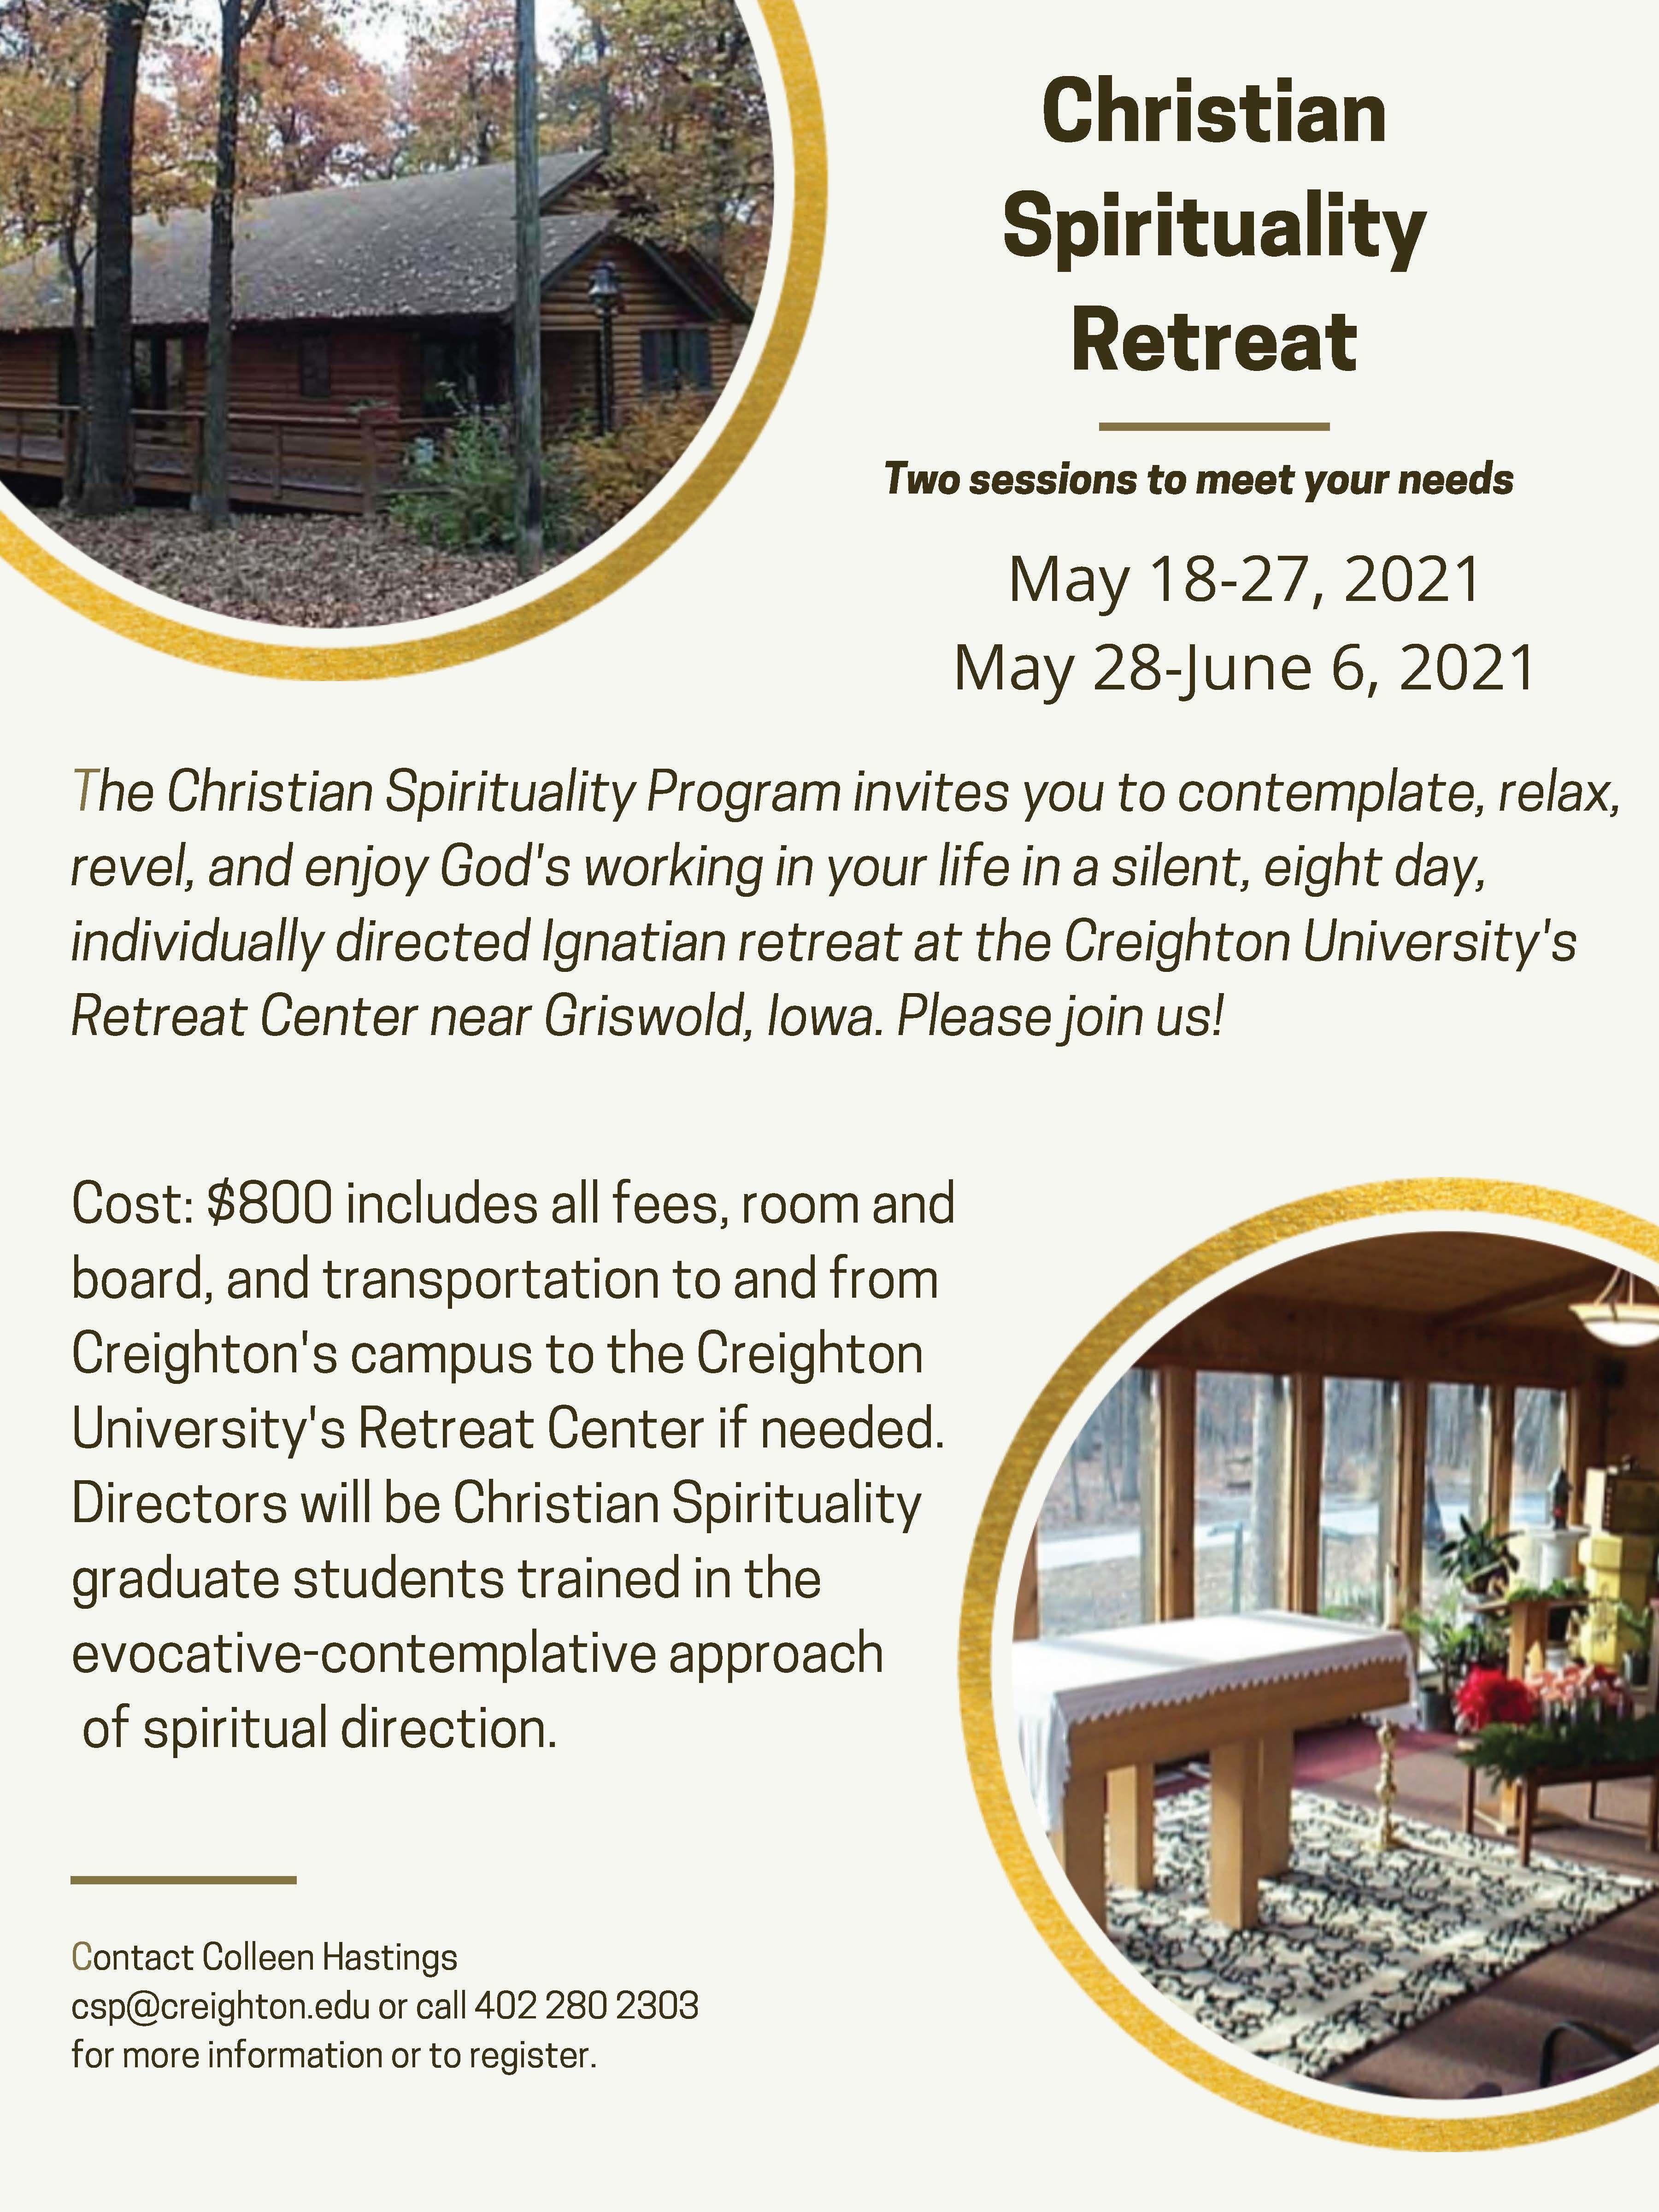 Christian Spirituality Retreat